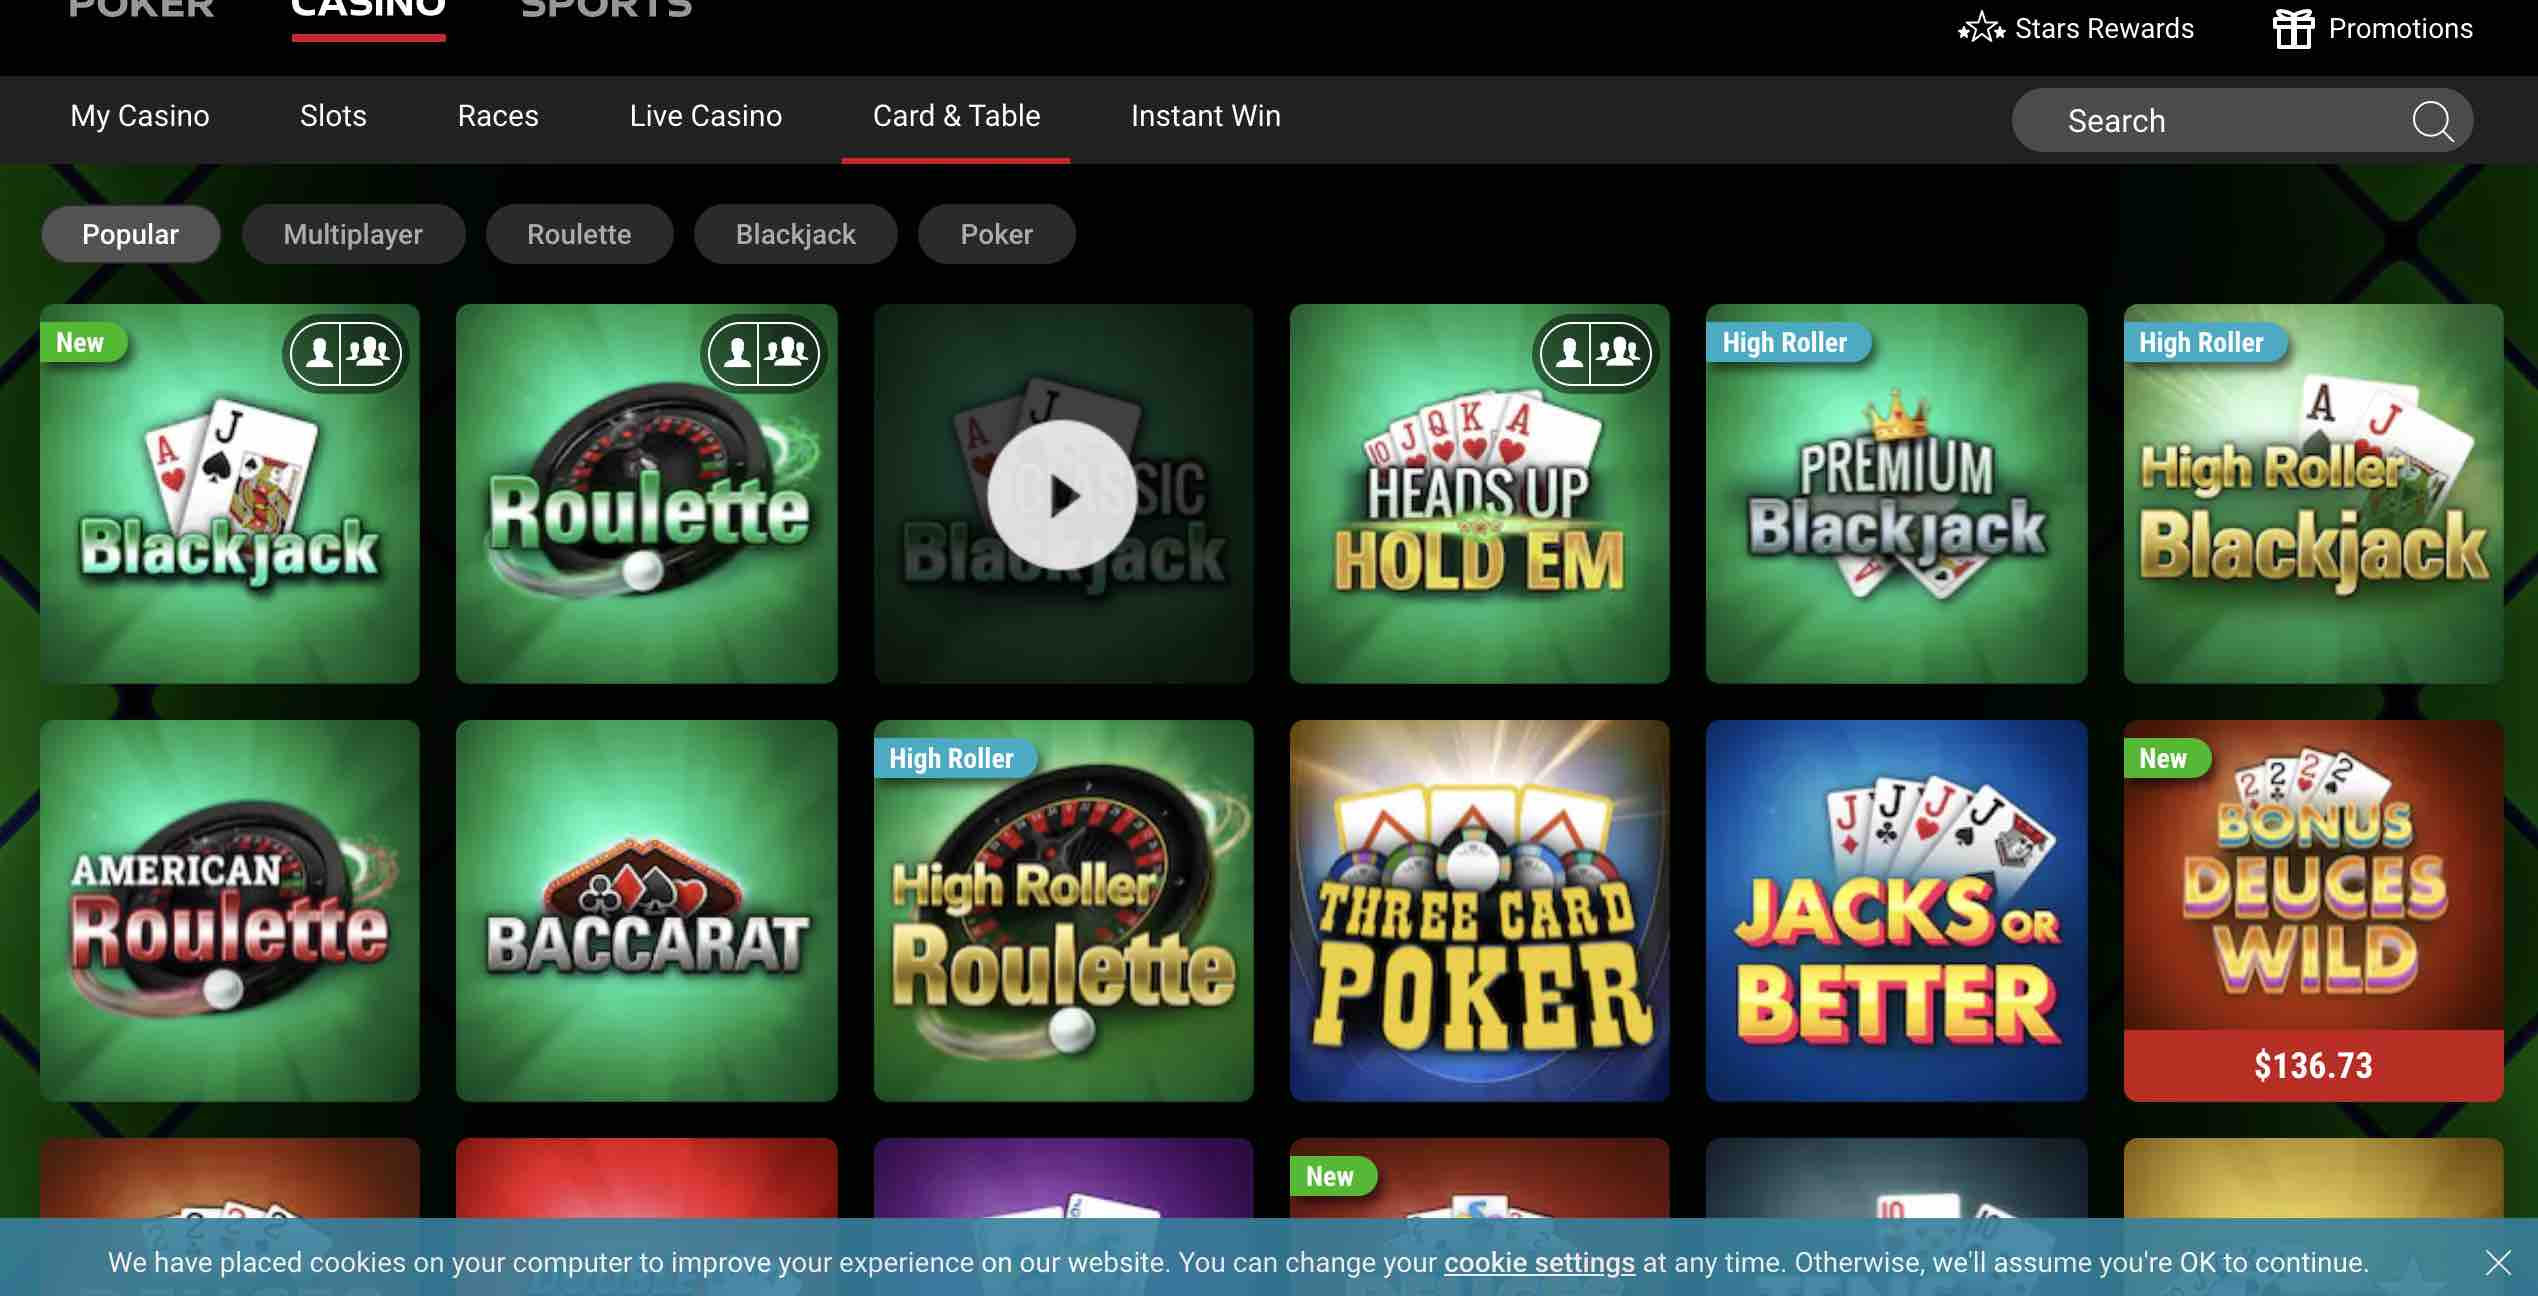 PokerStars Casino Table Games